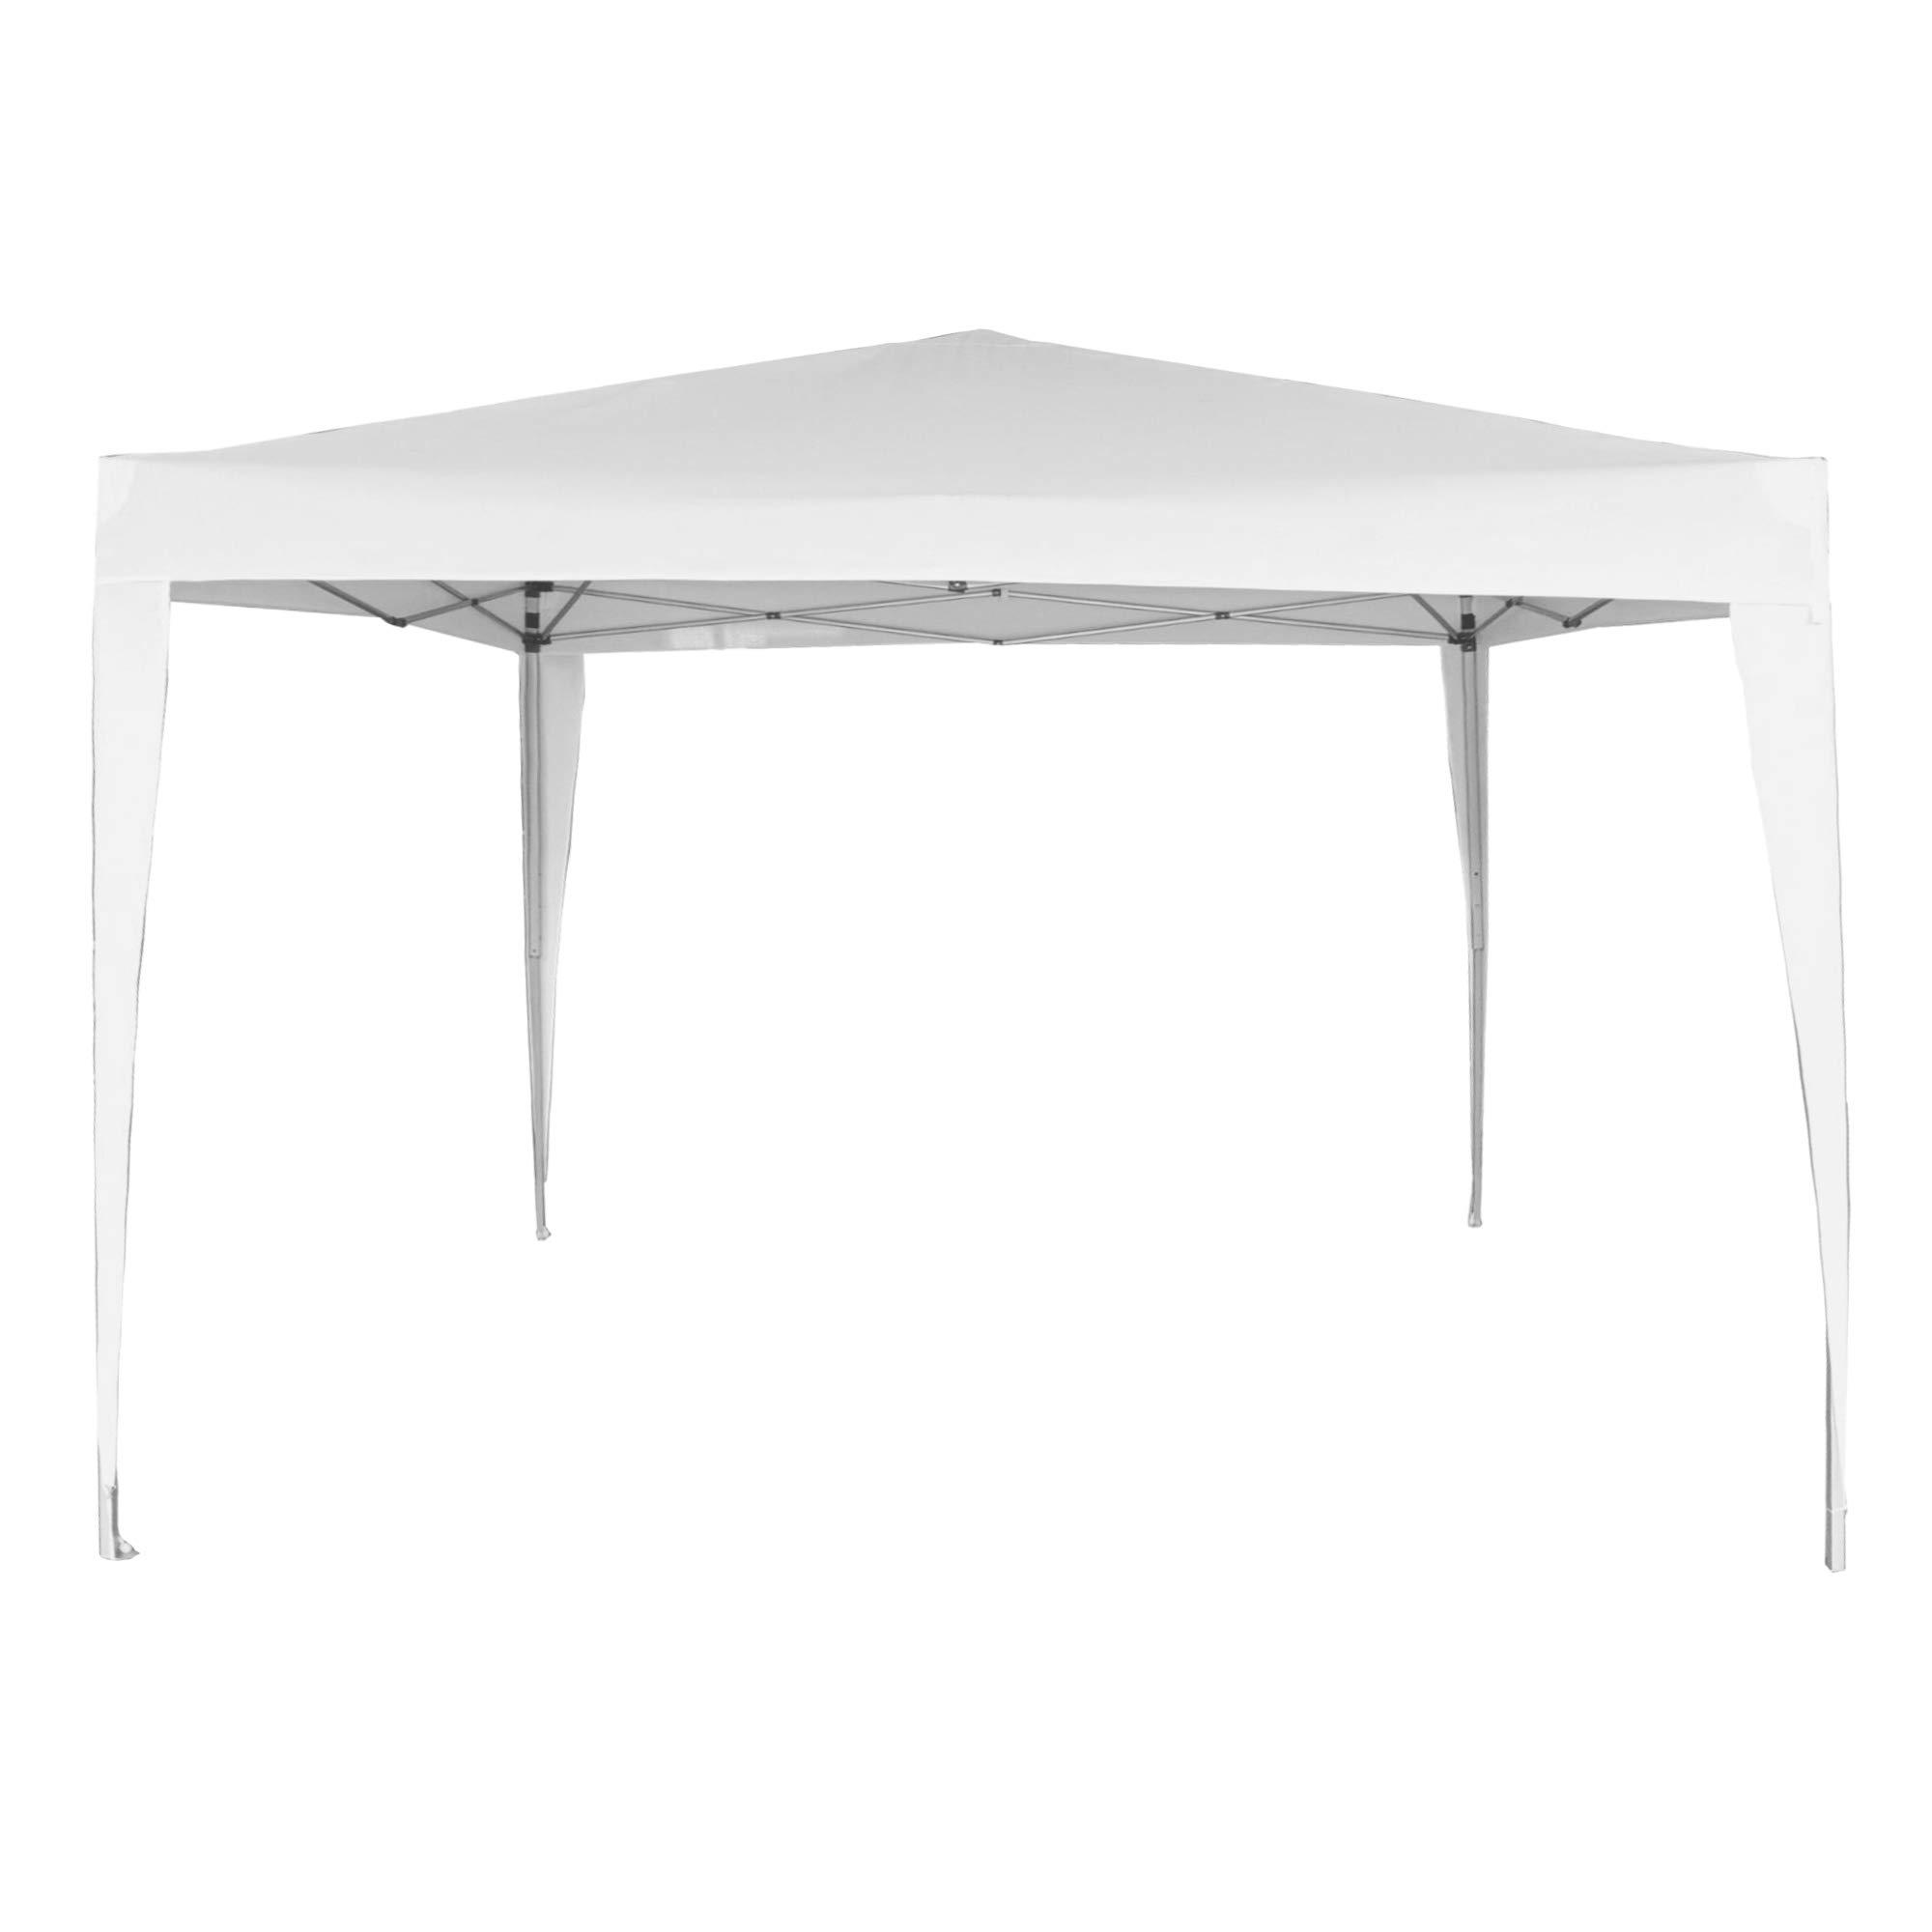 Aktive 62187 - Cenador plegable blanco poliéster UV50 300 x 300 x 240 cm Beach: Amazon.es: Jardín